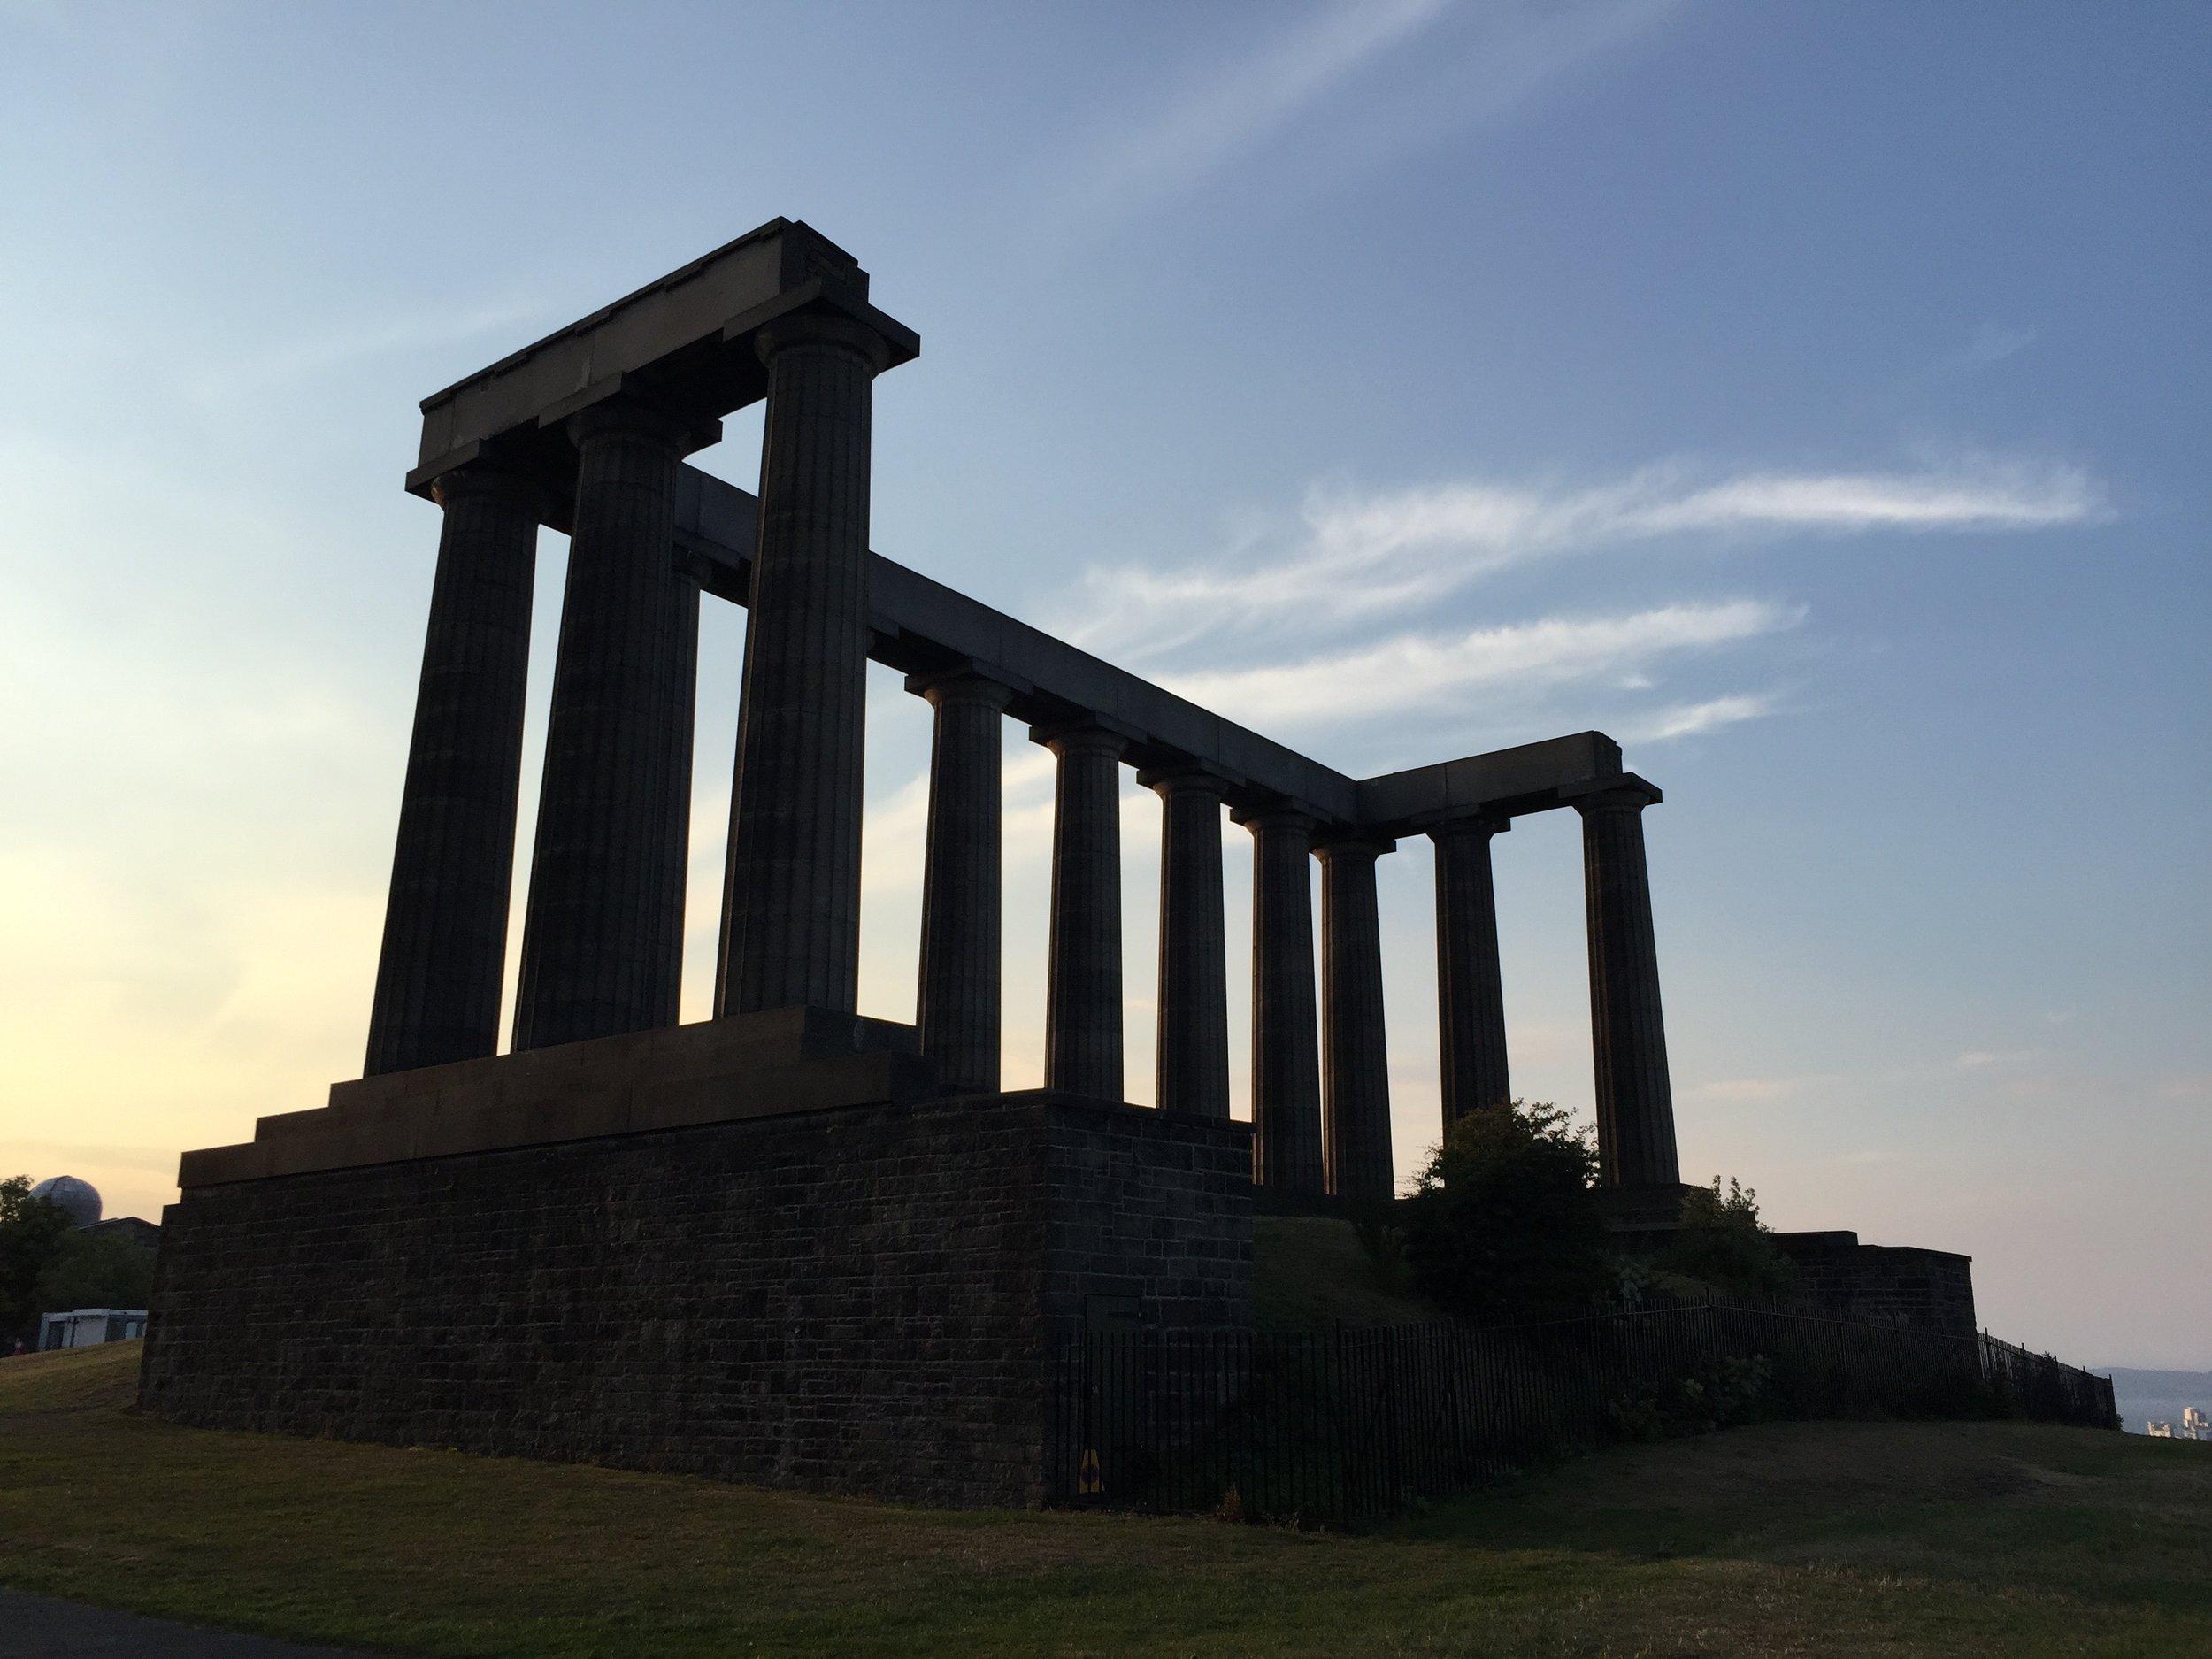 The National Monument of Scotland on Calton Hill, Edinburgh